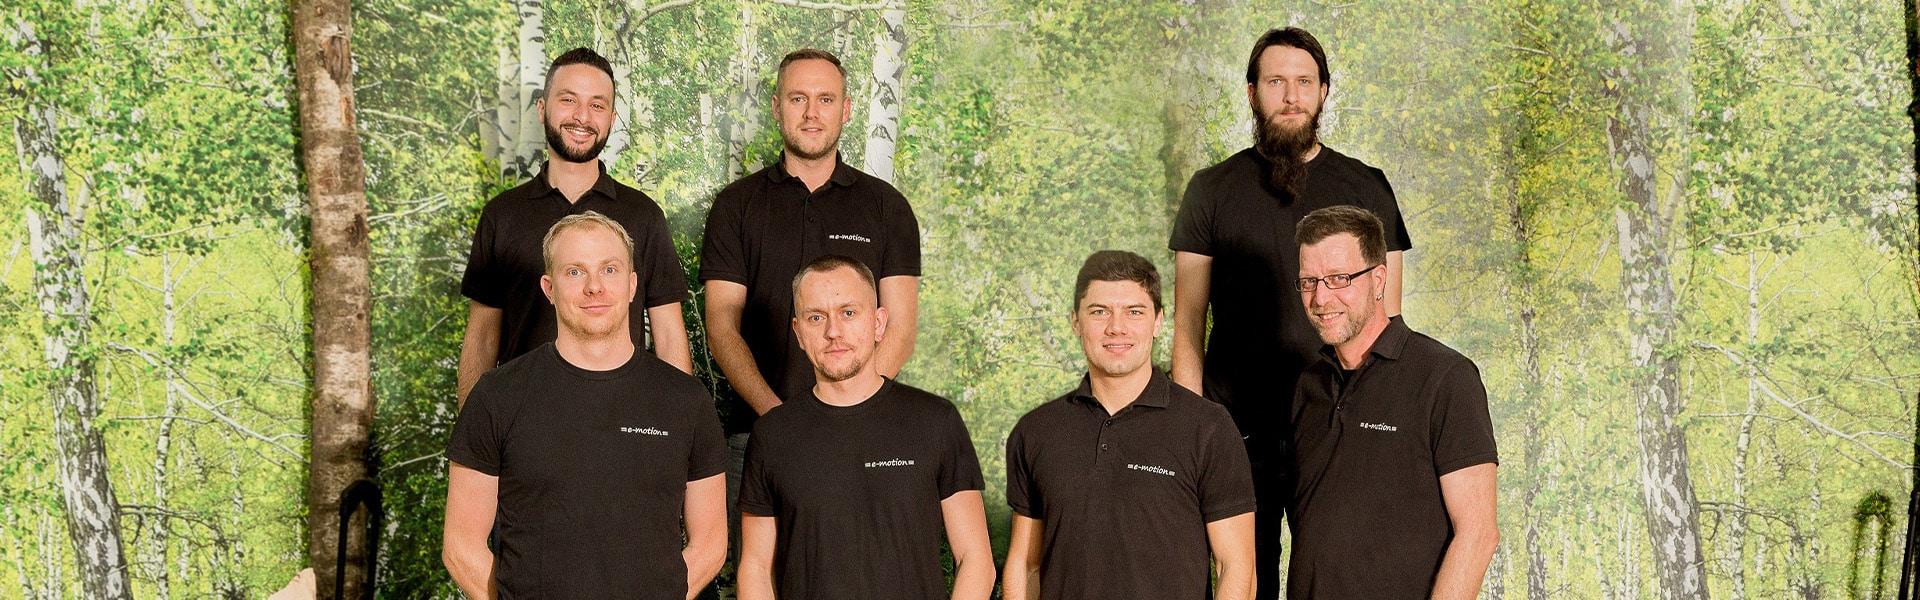 Das Team der e-motion e-Bike Welt Nürnberg West